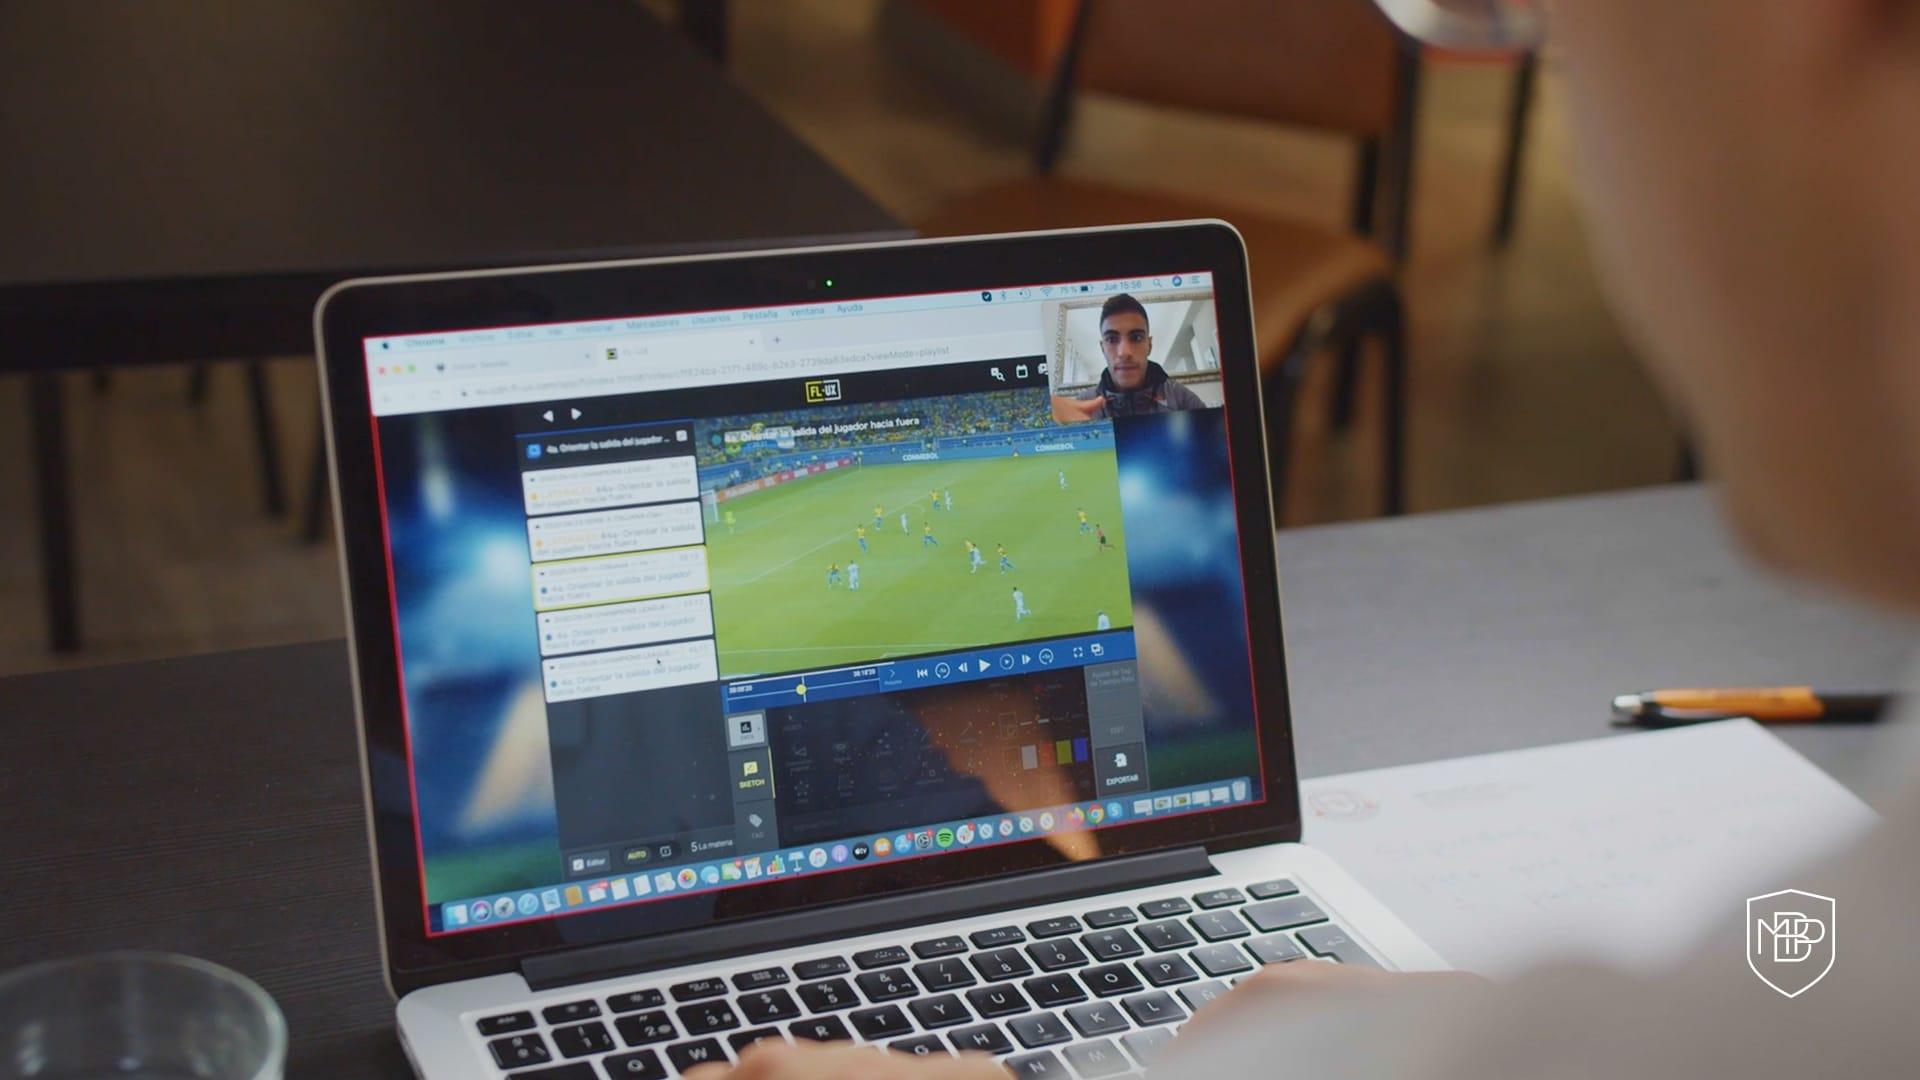 You are currently viewing Quels outils utilisons-nous pour l'analyse vidéo ?